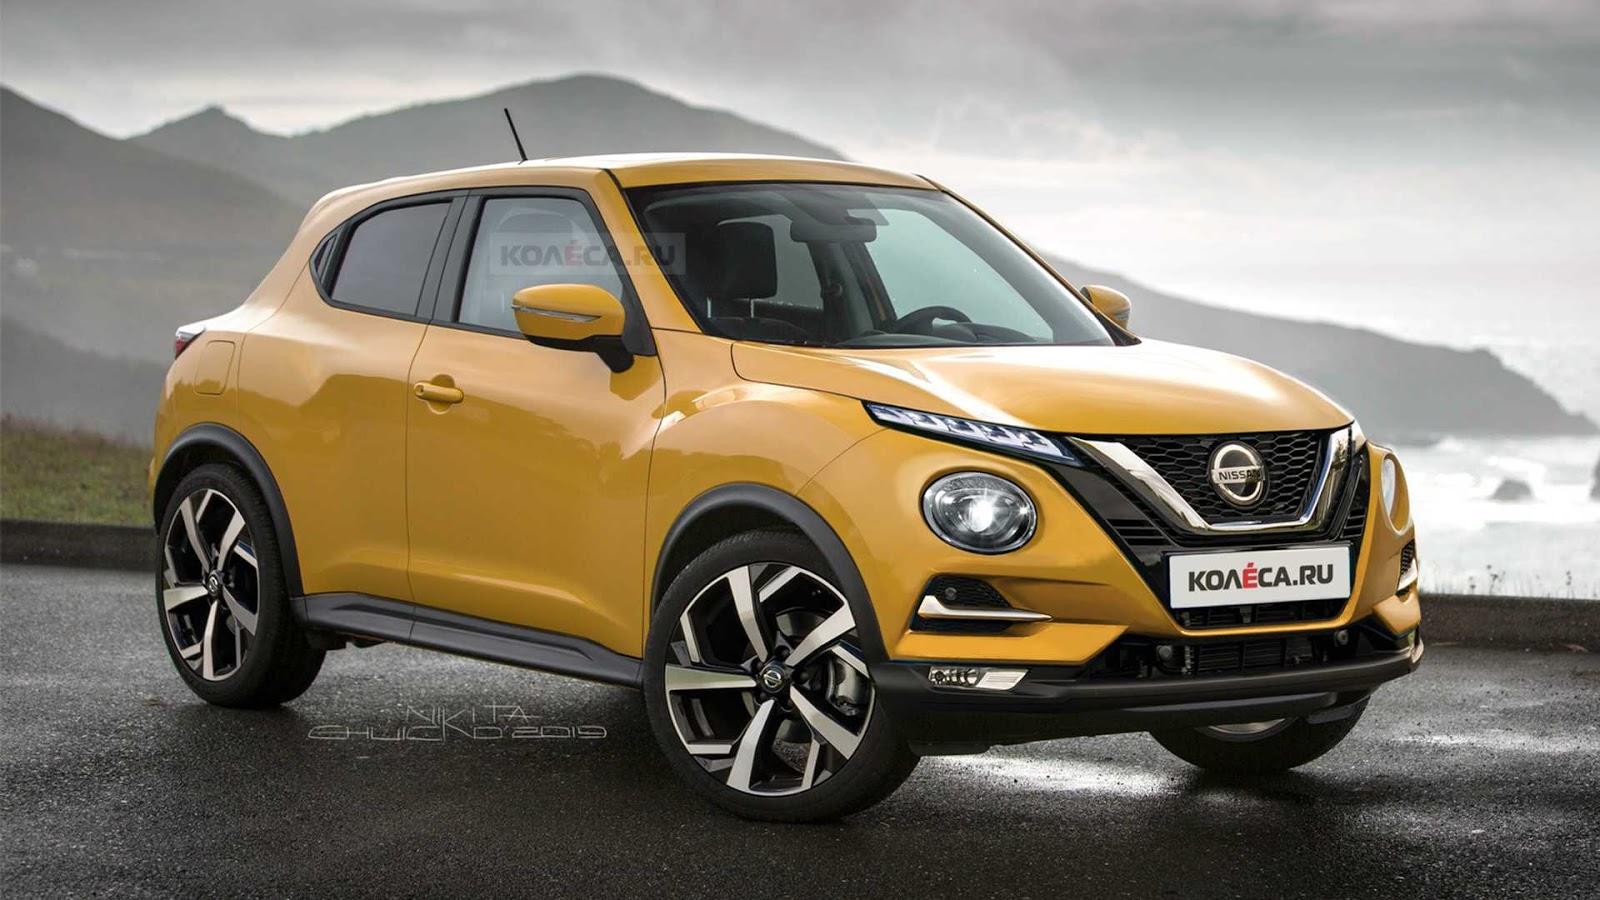 2020 nissan juke rendering Αύριο η πρεμιέρα του νέου Nissan Juke- Πώς θα είναι